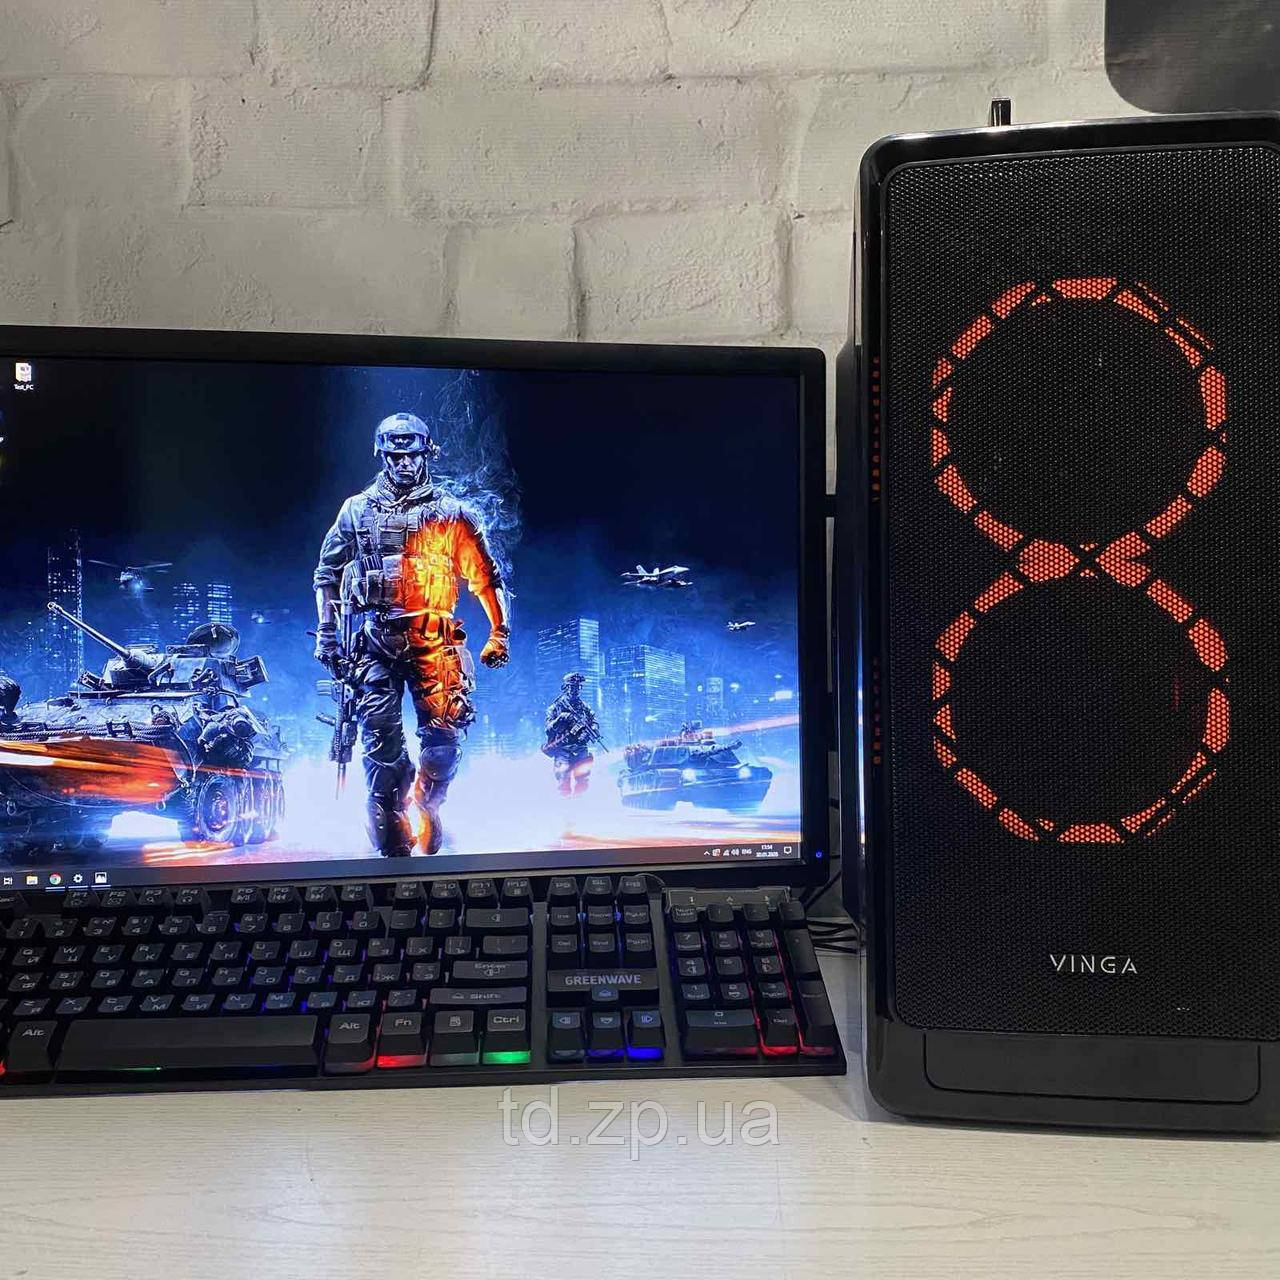 Игровой компьютер Ryzen 3 1200 + NVIDIA GTX 1060 3Gb + RAM 8Gb + SSD 240Gb